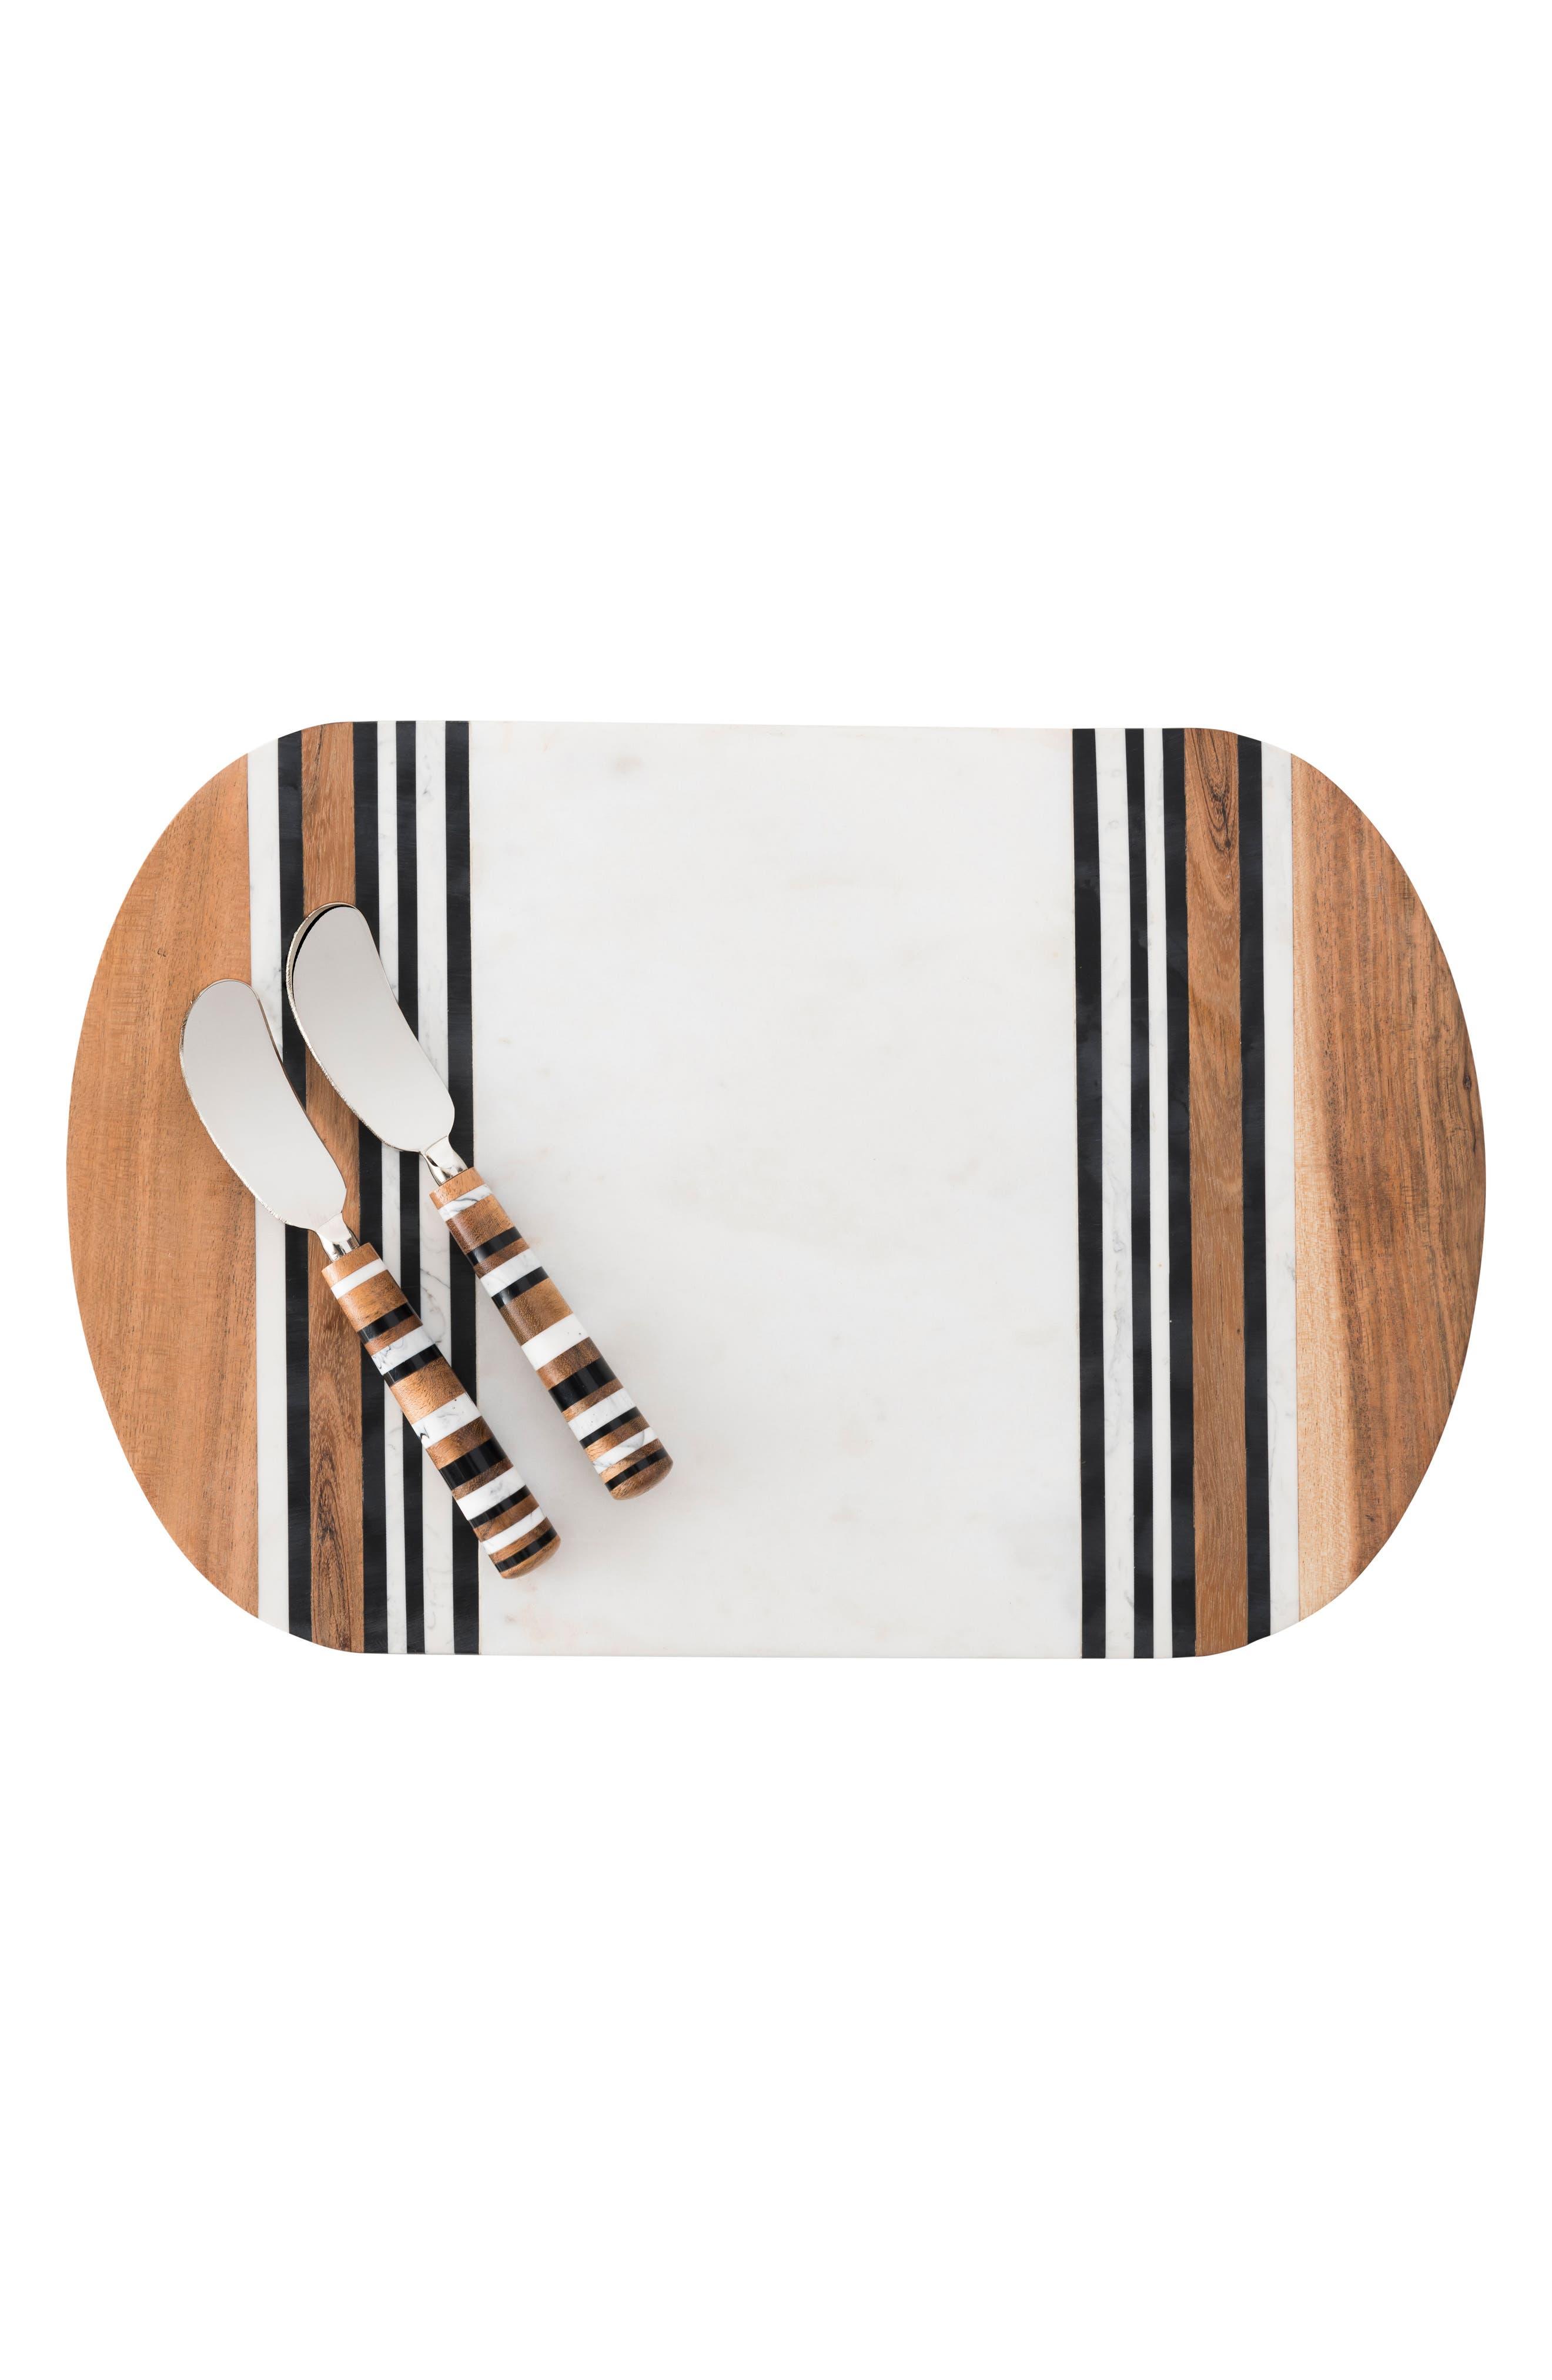 JULISKA, Stonewood Stripe Serving Board & Spreaders, Main thumbnail 1, color, NATURAL STRIPE